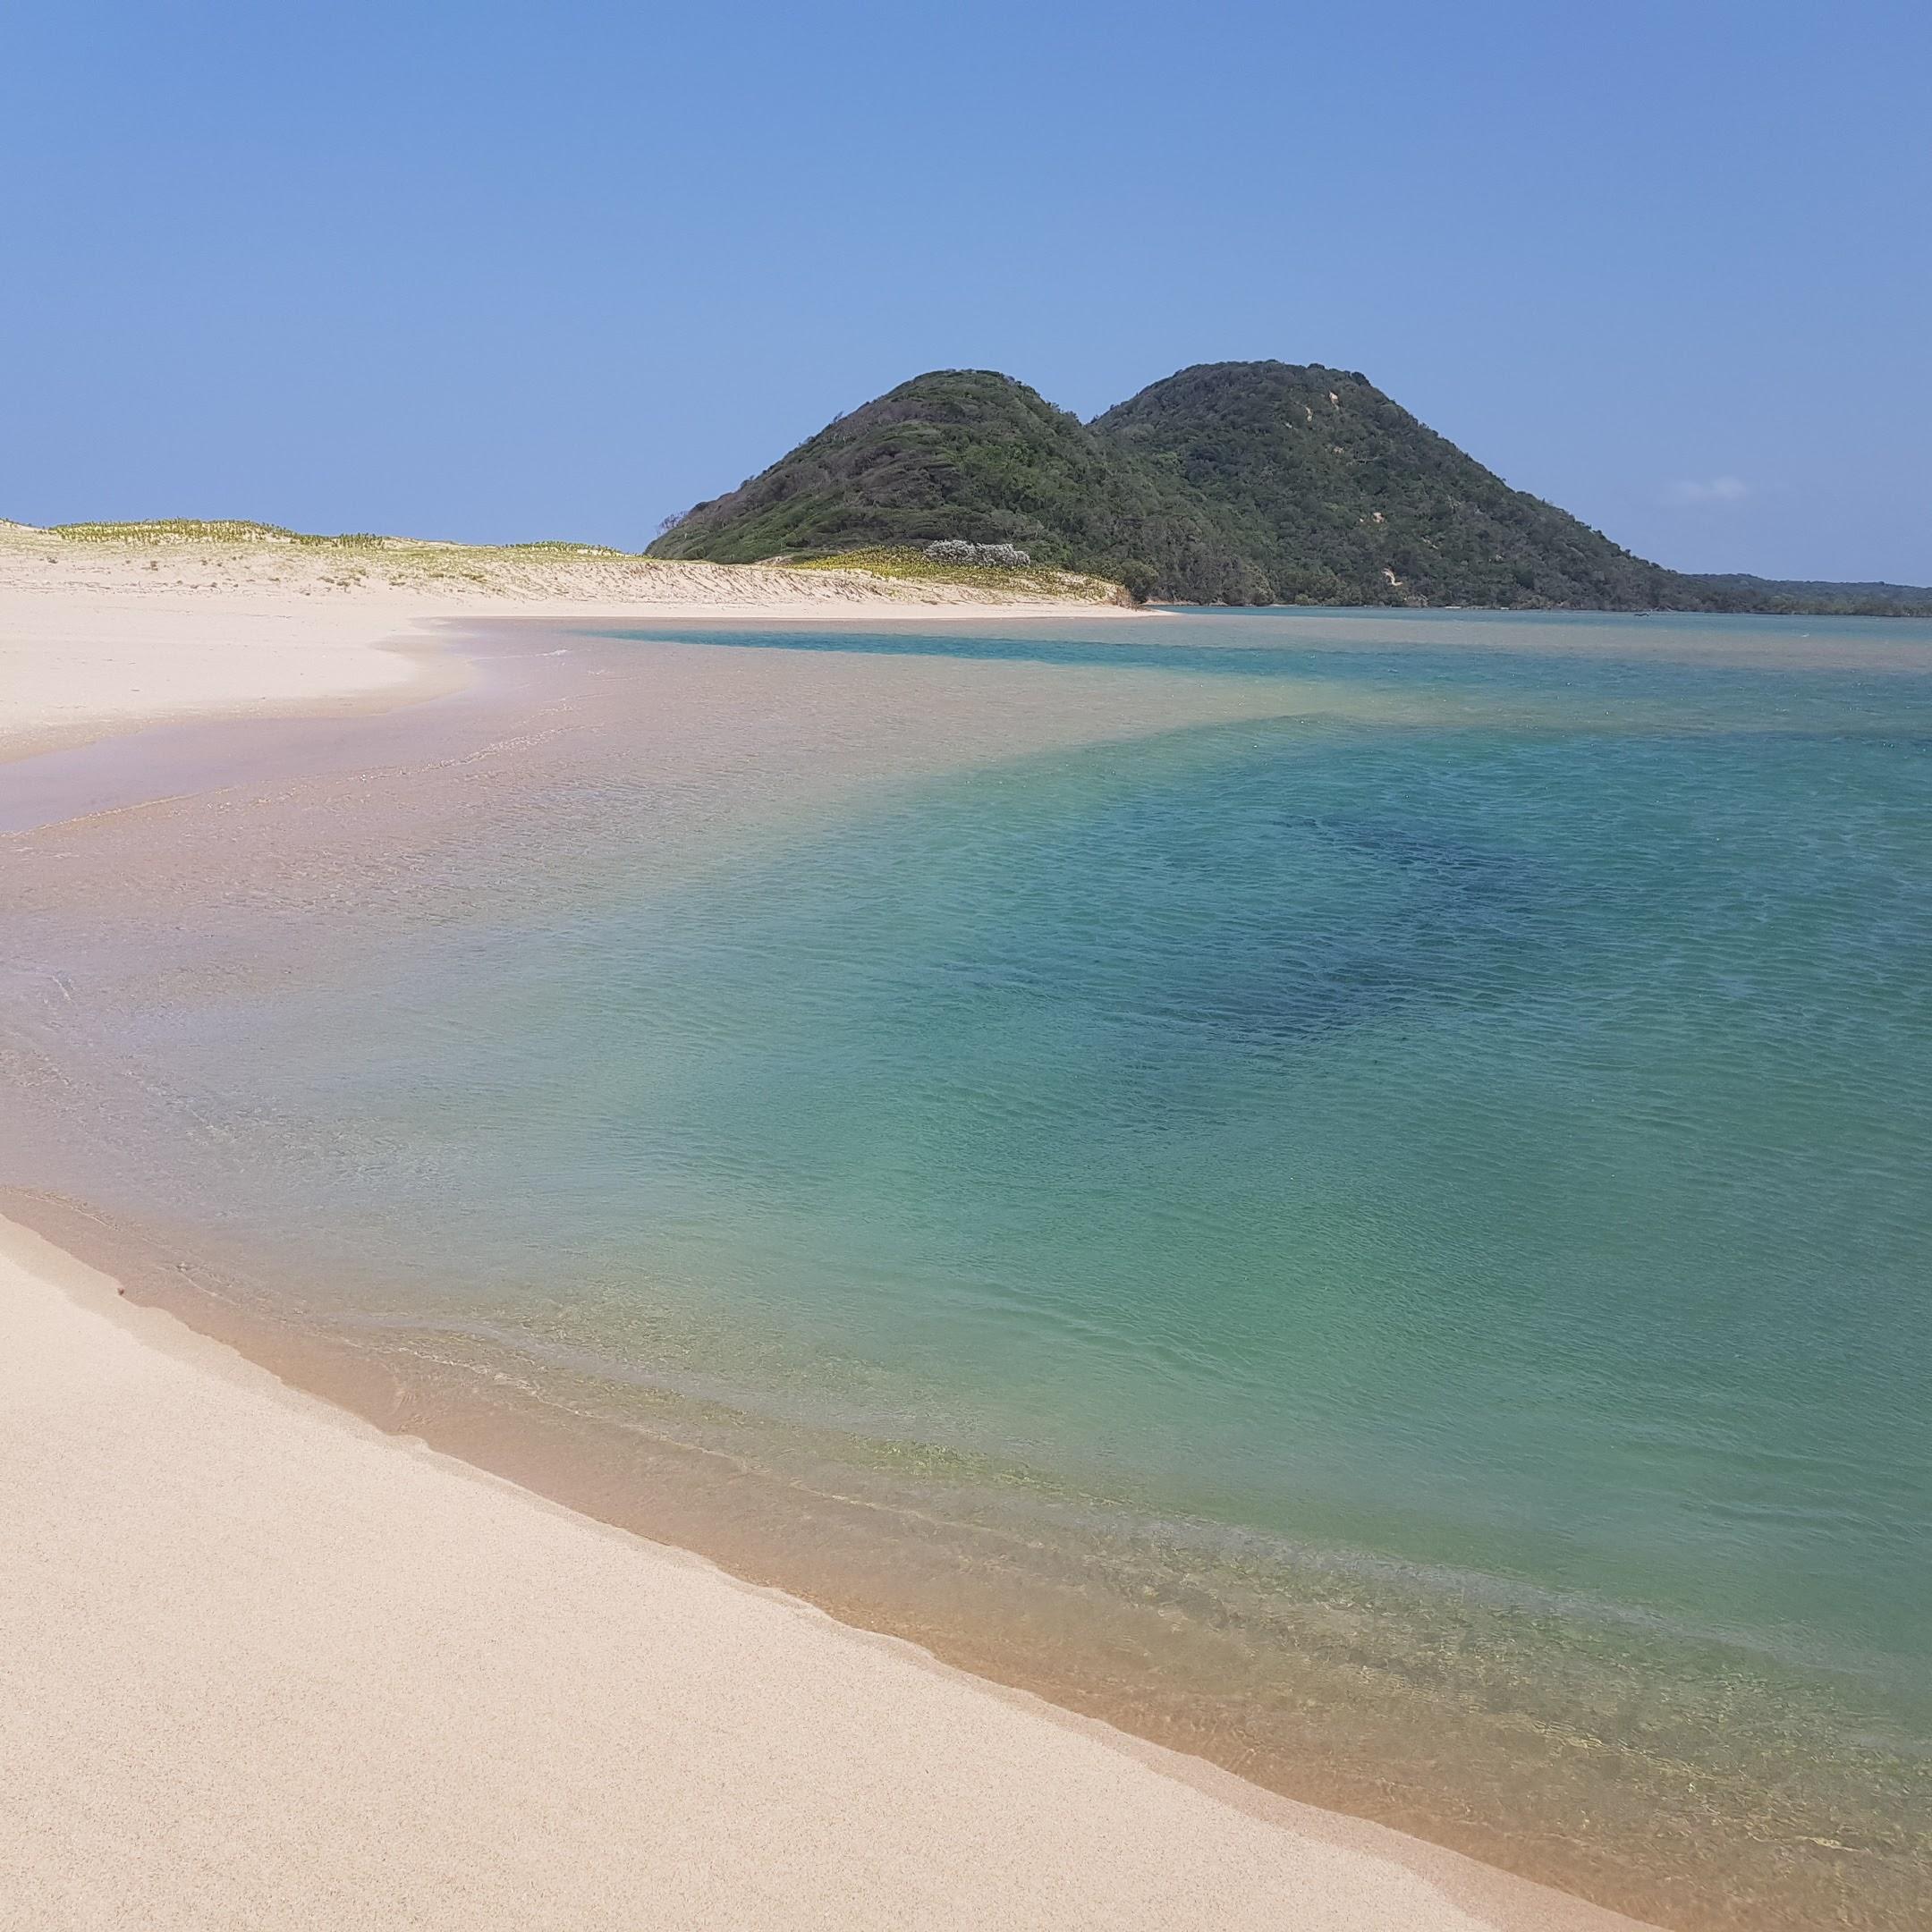 Kosi Bay Surroundings